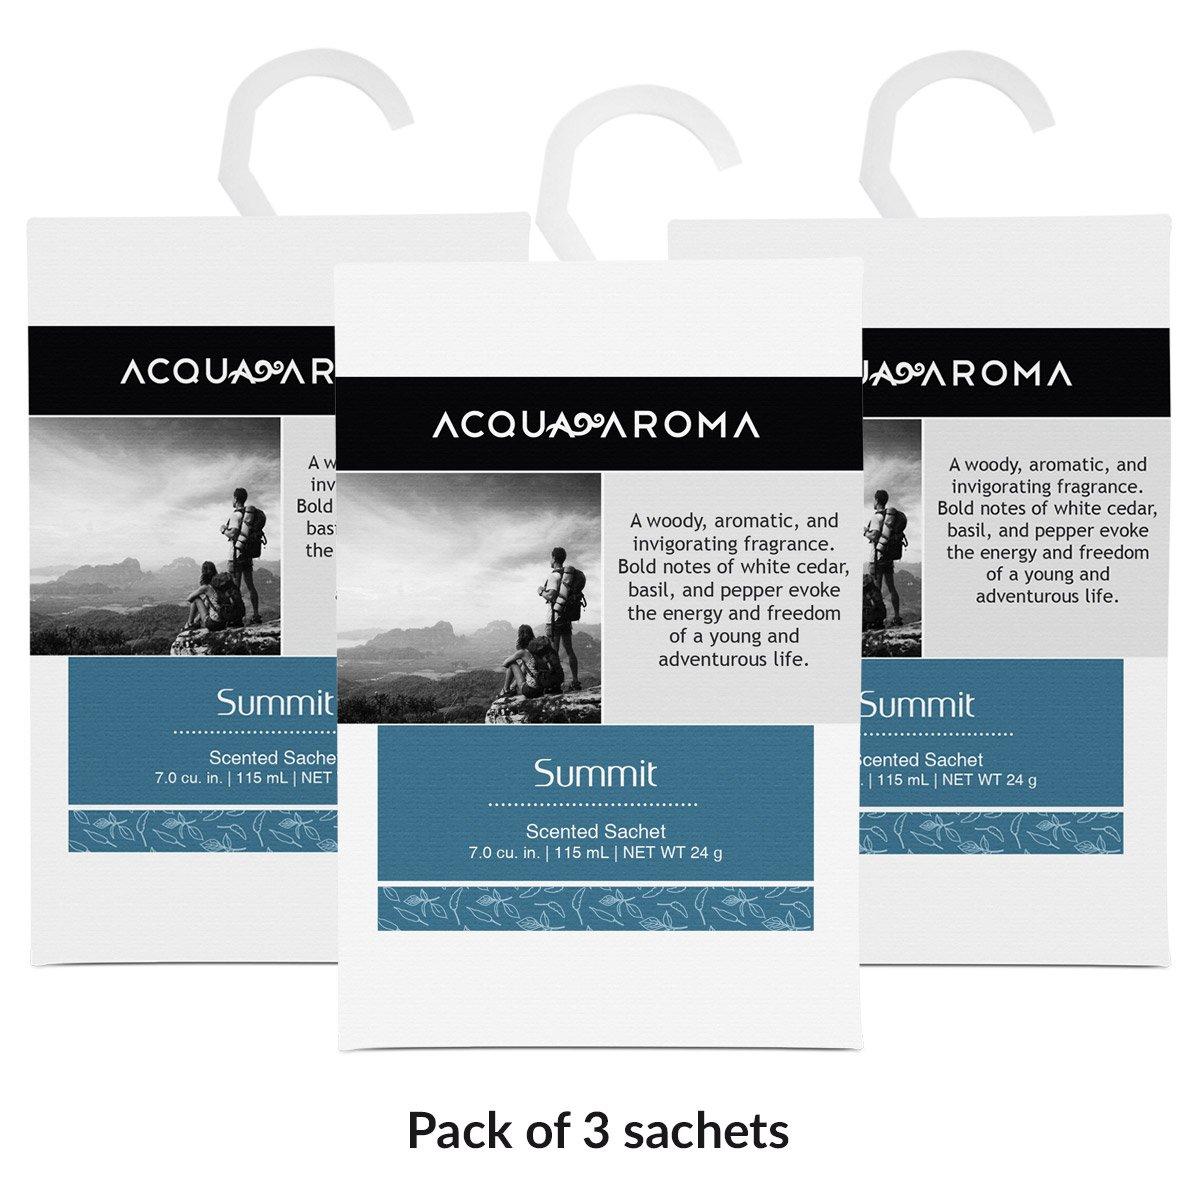 Acquaアロマサミット香りつきSachet 7.0 cu. in 115ml 24g of 公式ショップ B01M3Q27NM Sachets Pack 激安価格と即納で通信販売 ndash; 3